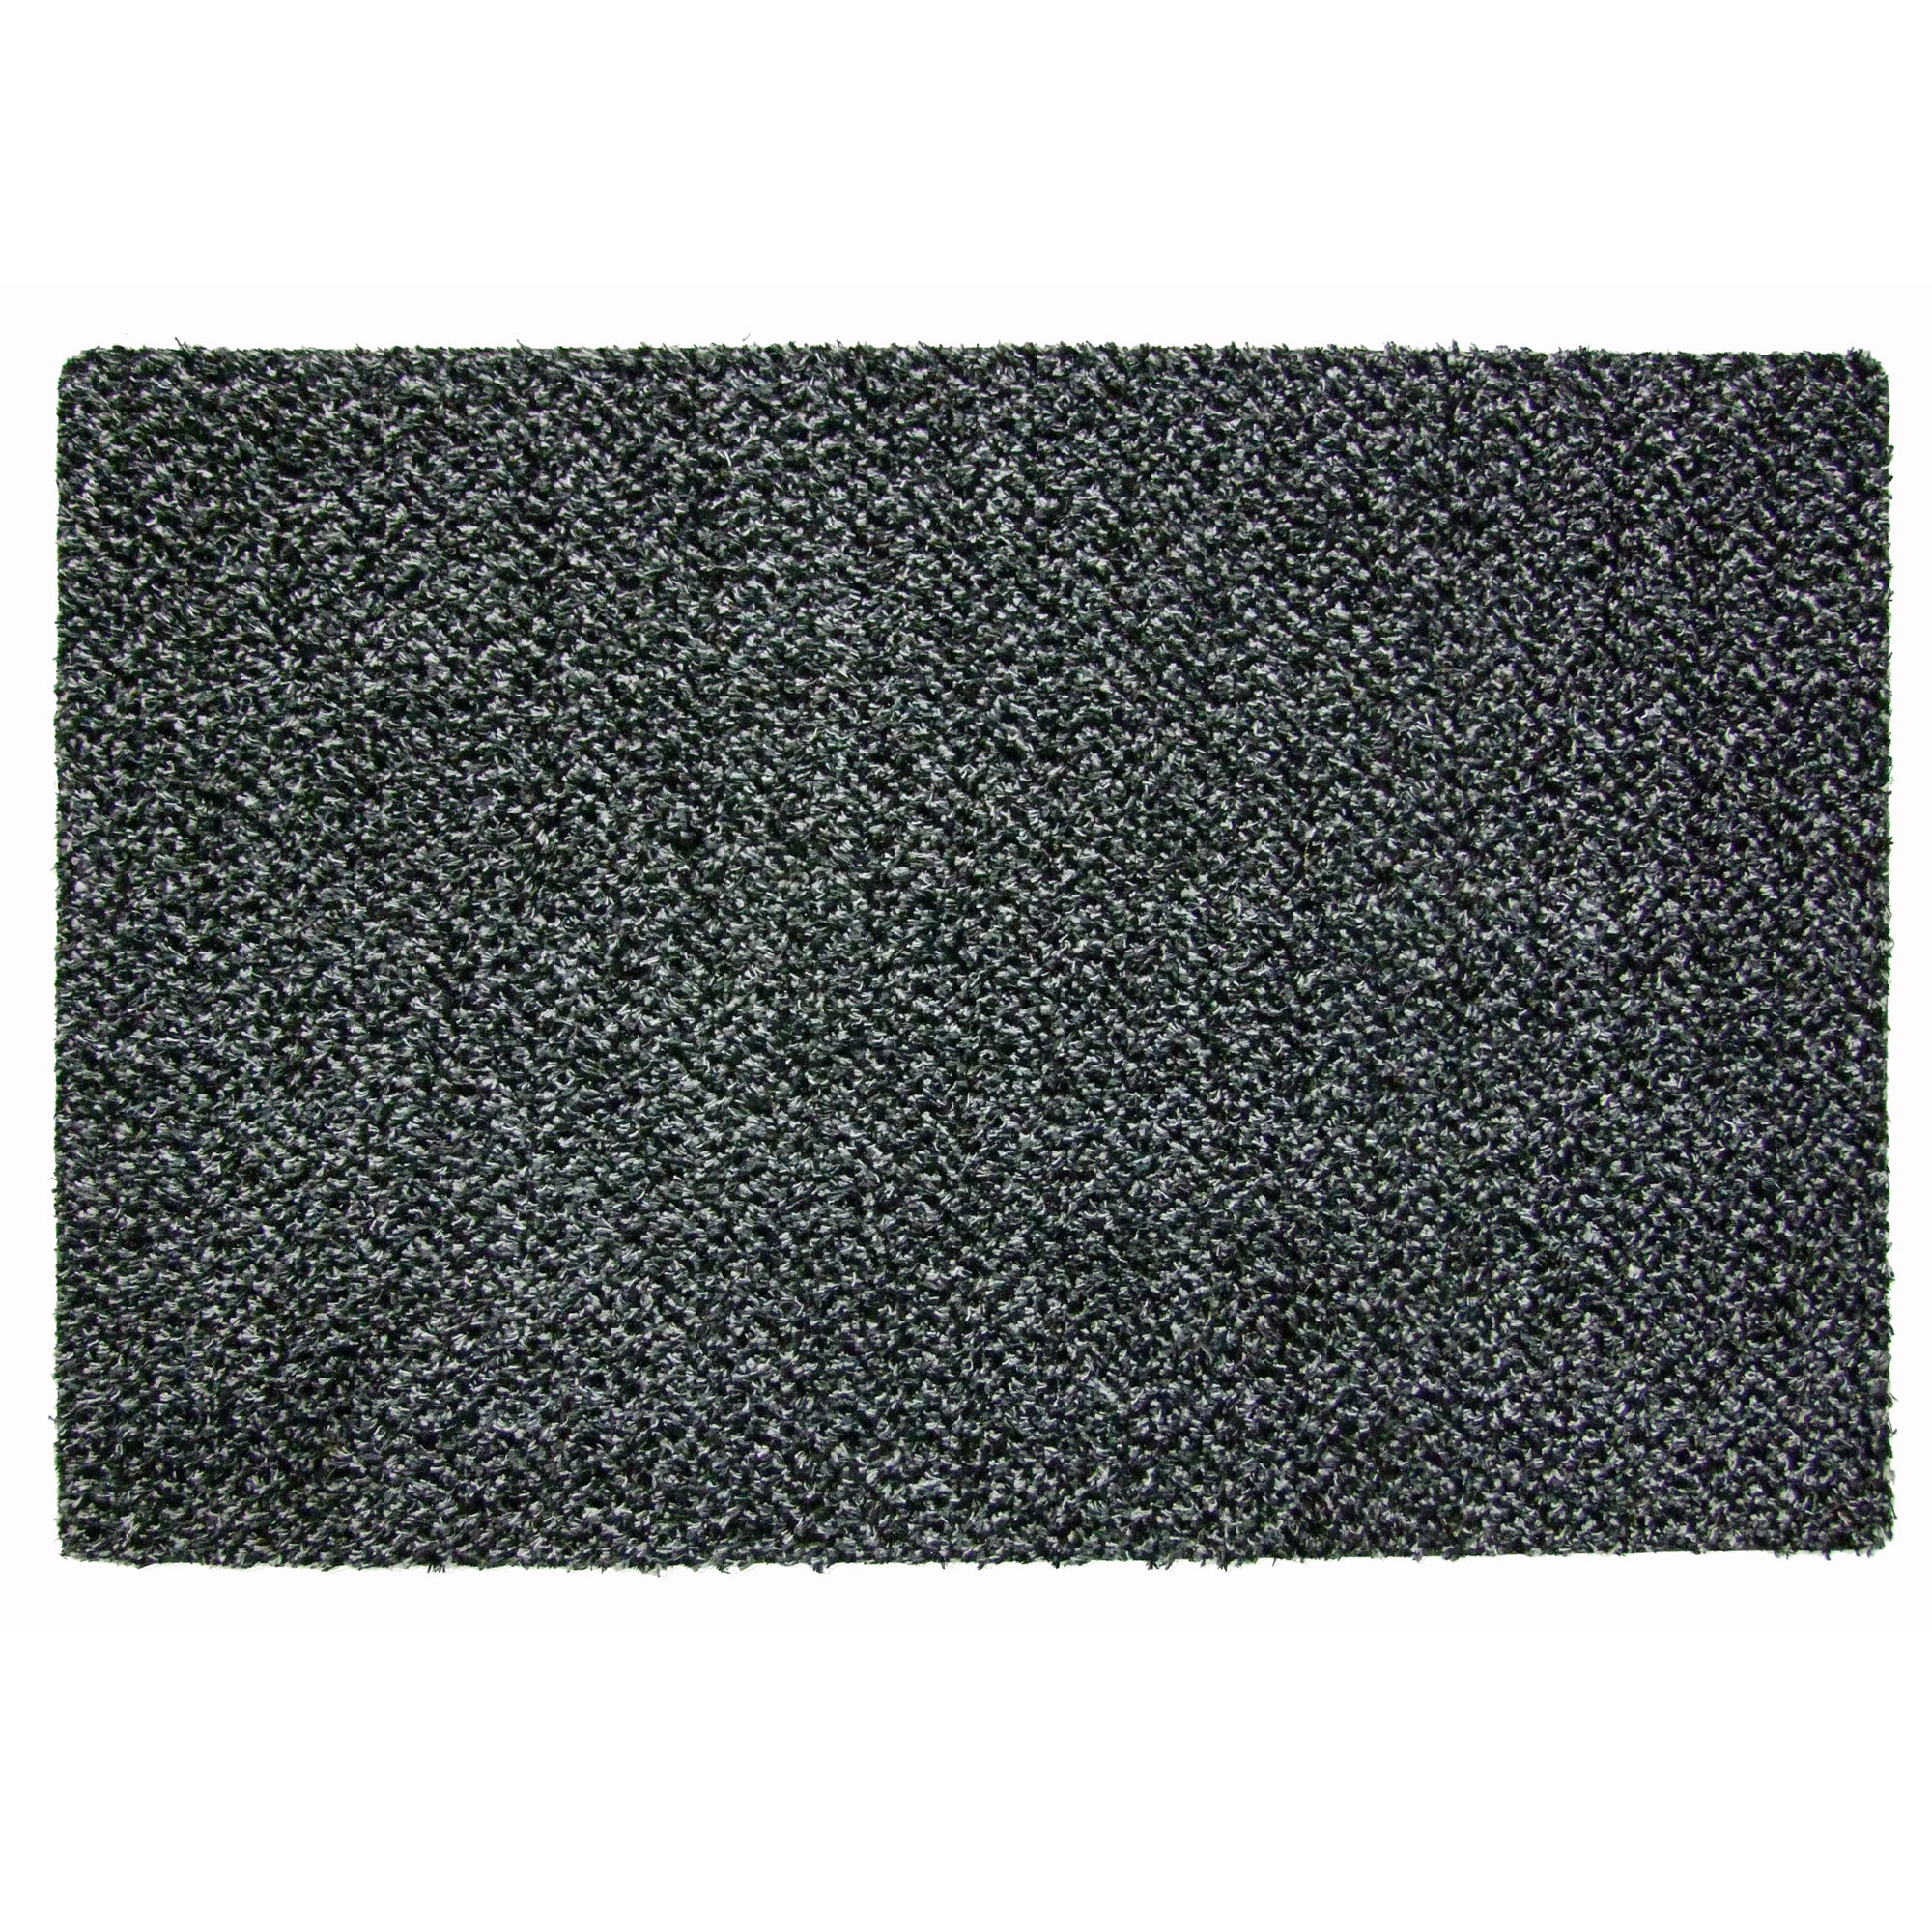 Black Mighty Scraper Mat